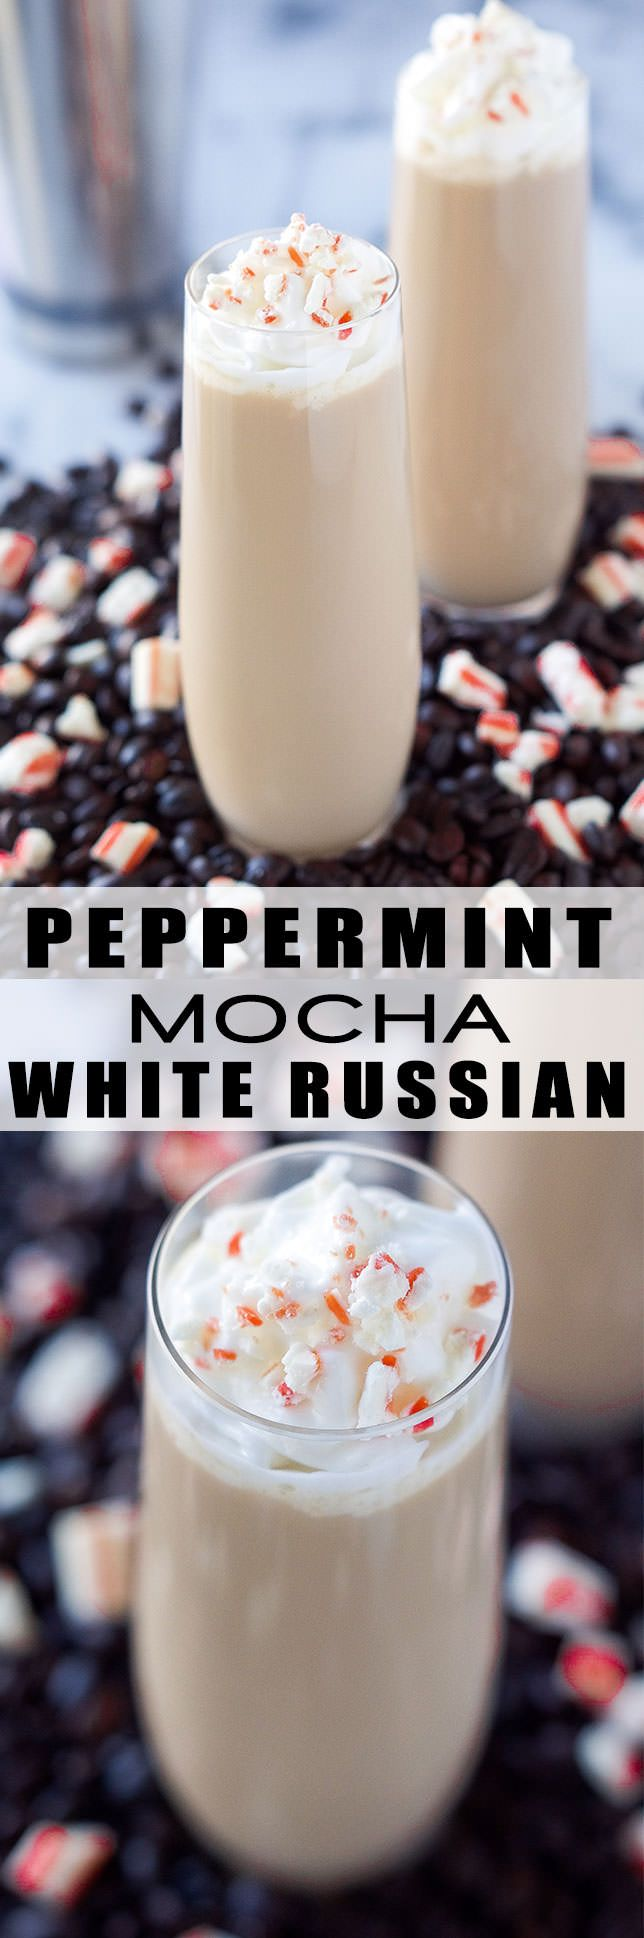 Peppermint Mocha White Russian Recipe | Holidays, Drink, Easy, Vodka, Skinny, Cocktail, Baileys